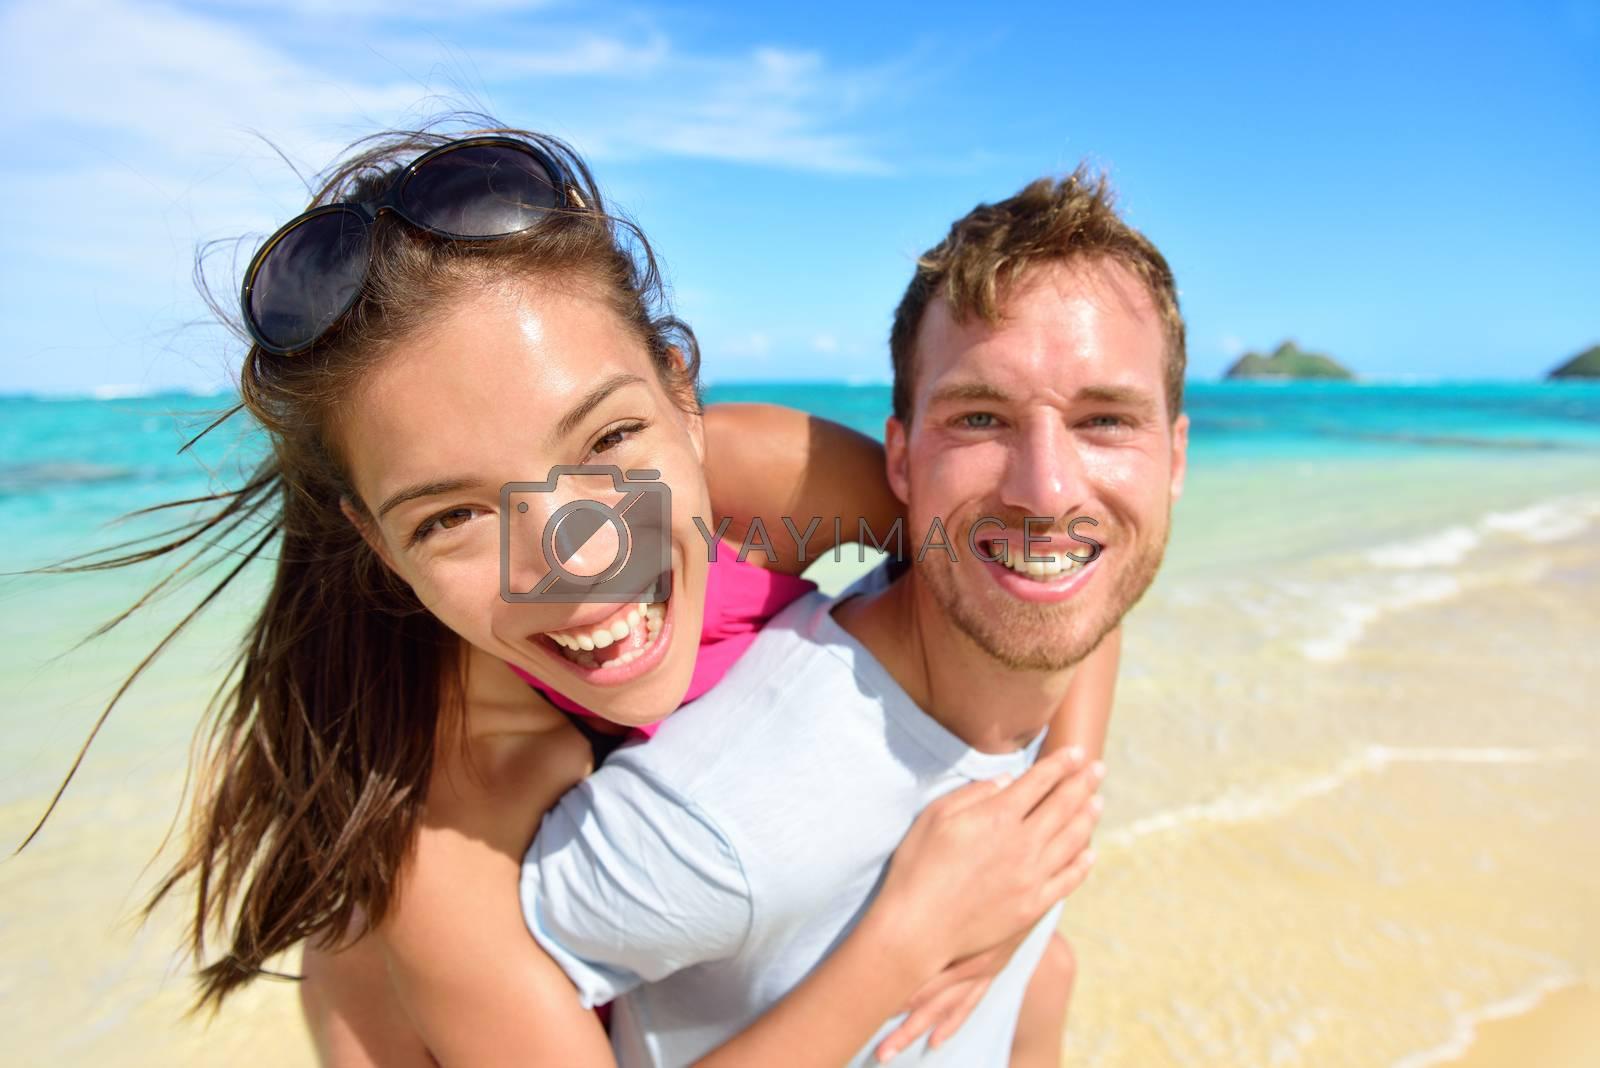 Happy beach couple in love on summer vacations on Lanikai beach, Oahu, Hawaii, USA with Mokulua Islands. Joyful Asian girl piggybacking on young Caucasian boyfriend and having fun on travel holiday.